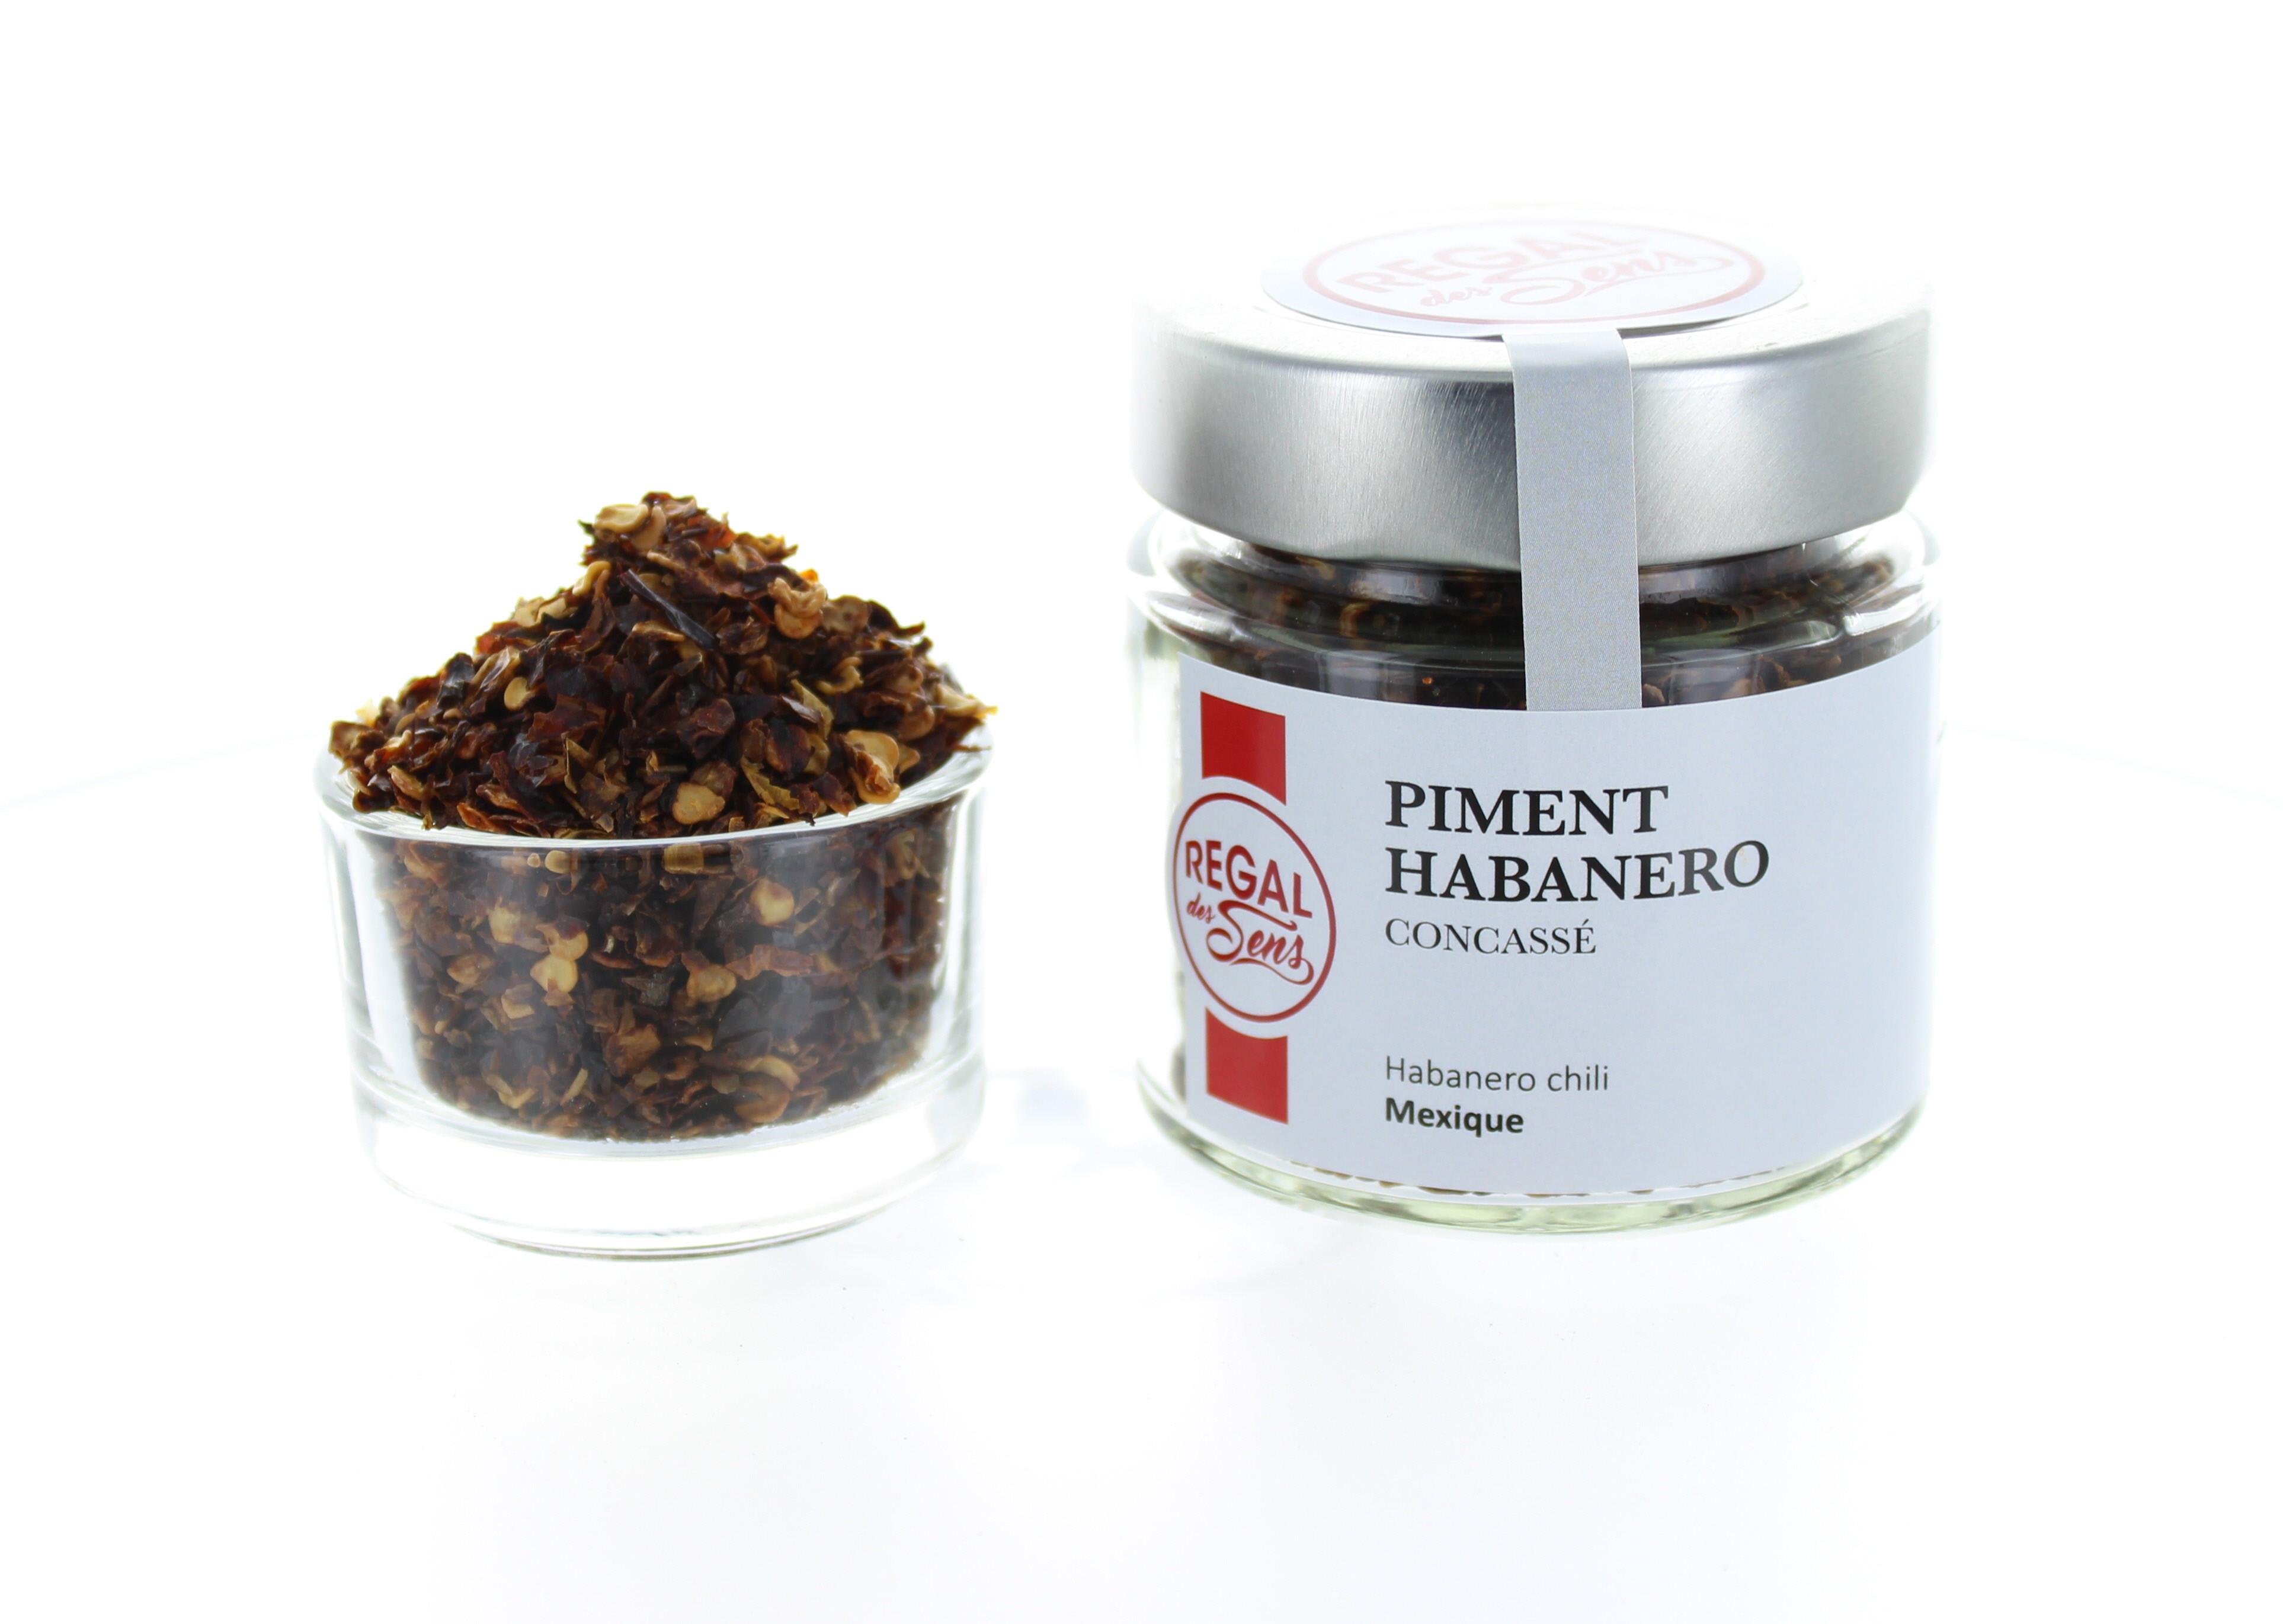 Piment Habanero